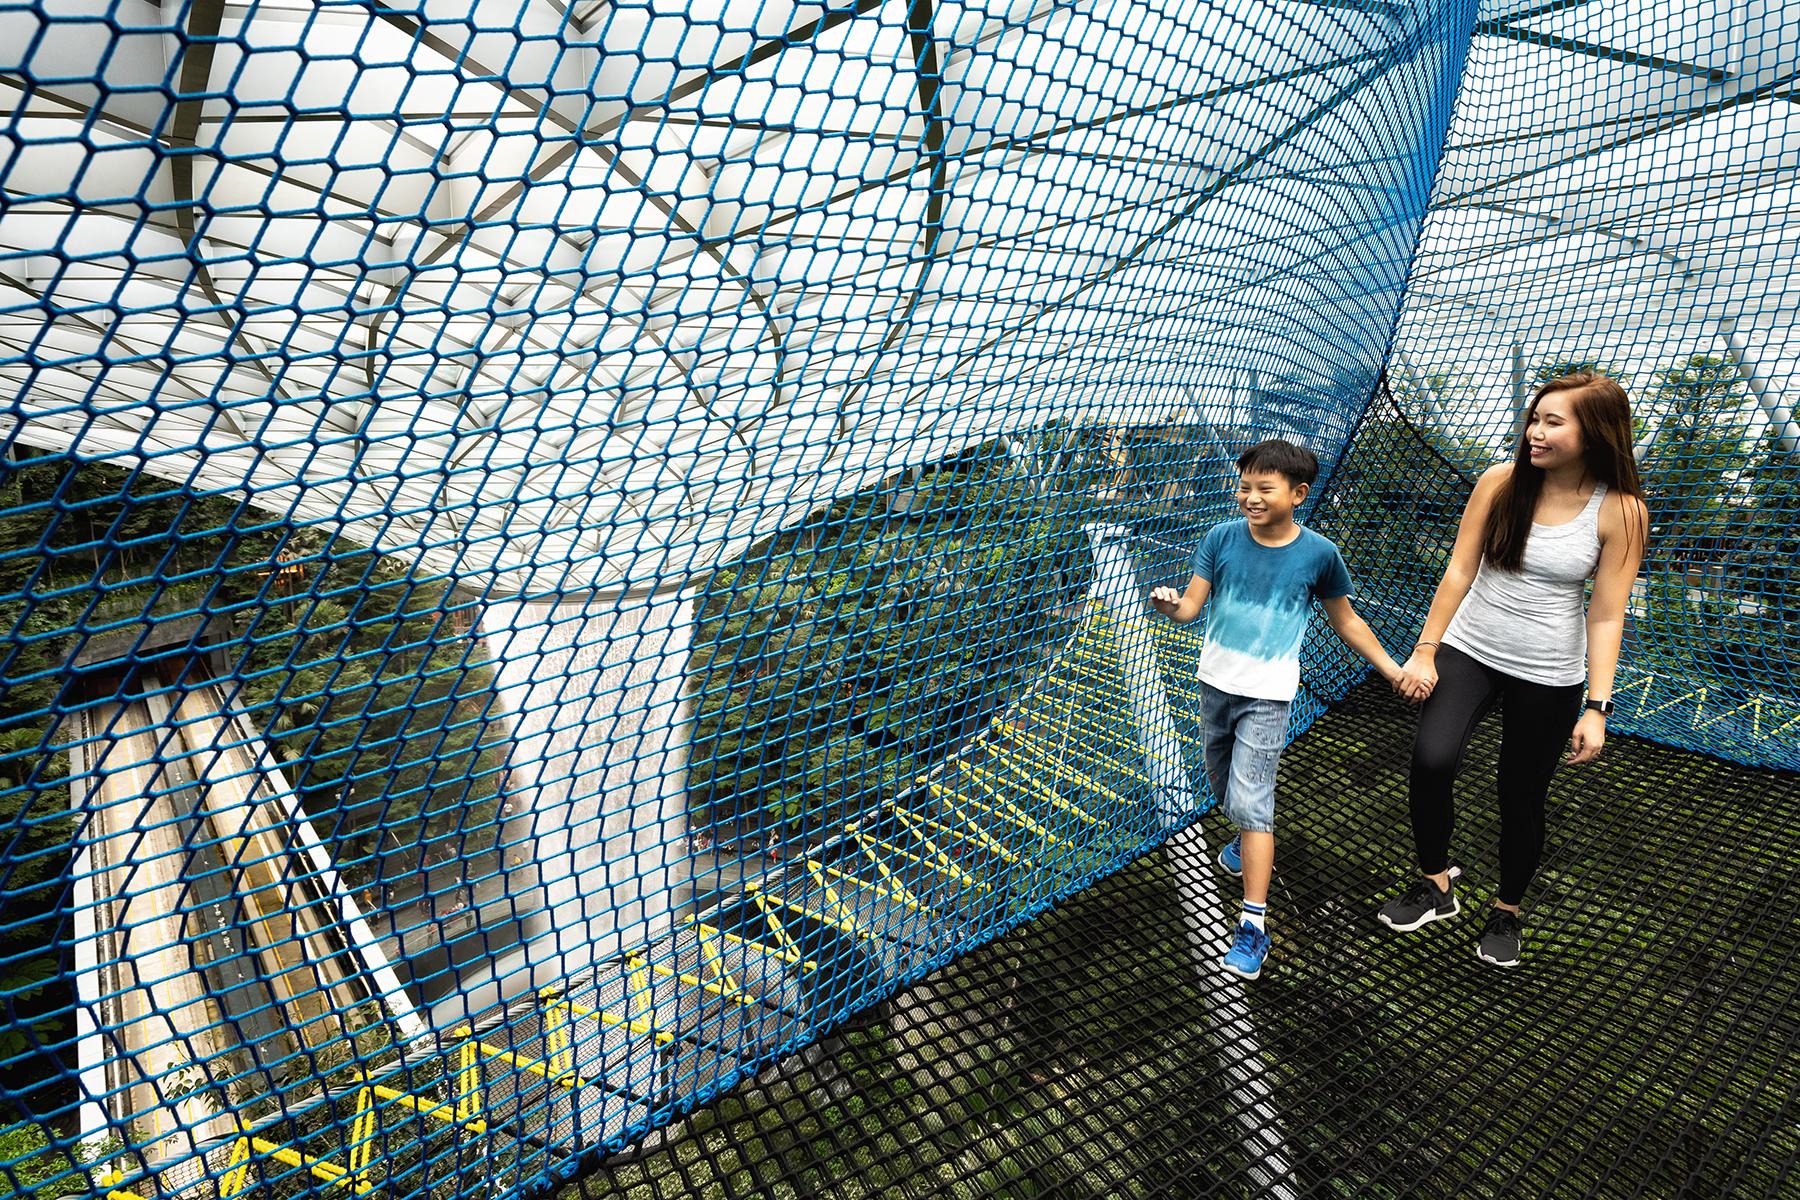 singapore-photographer-manulife-jewel-skynets-05.jpg